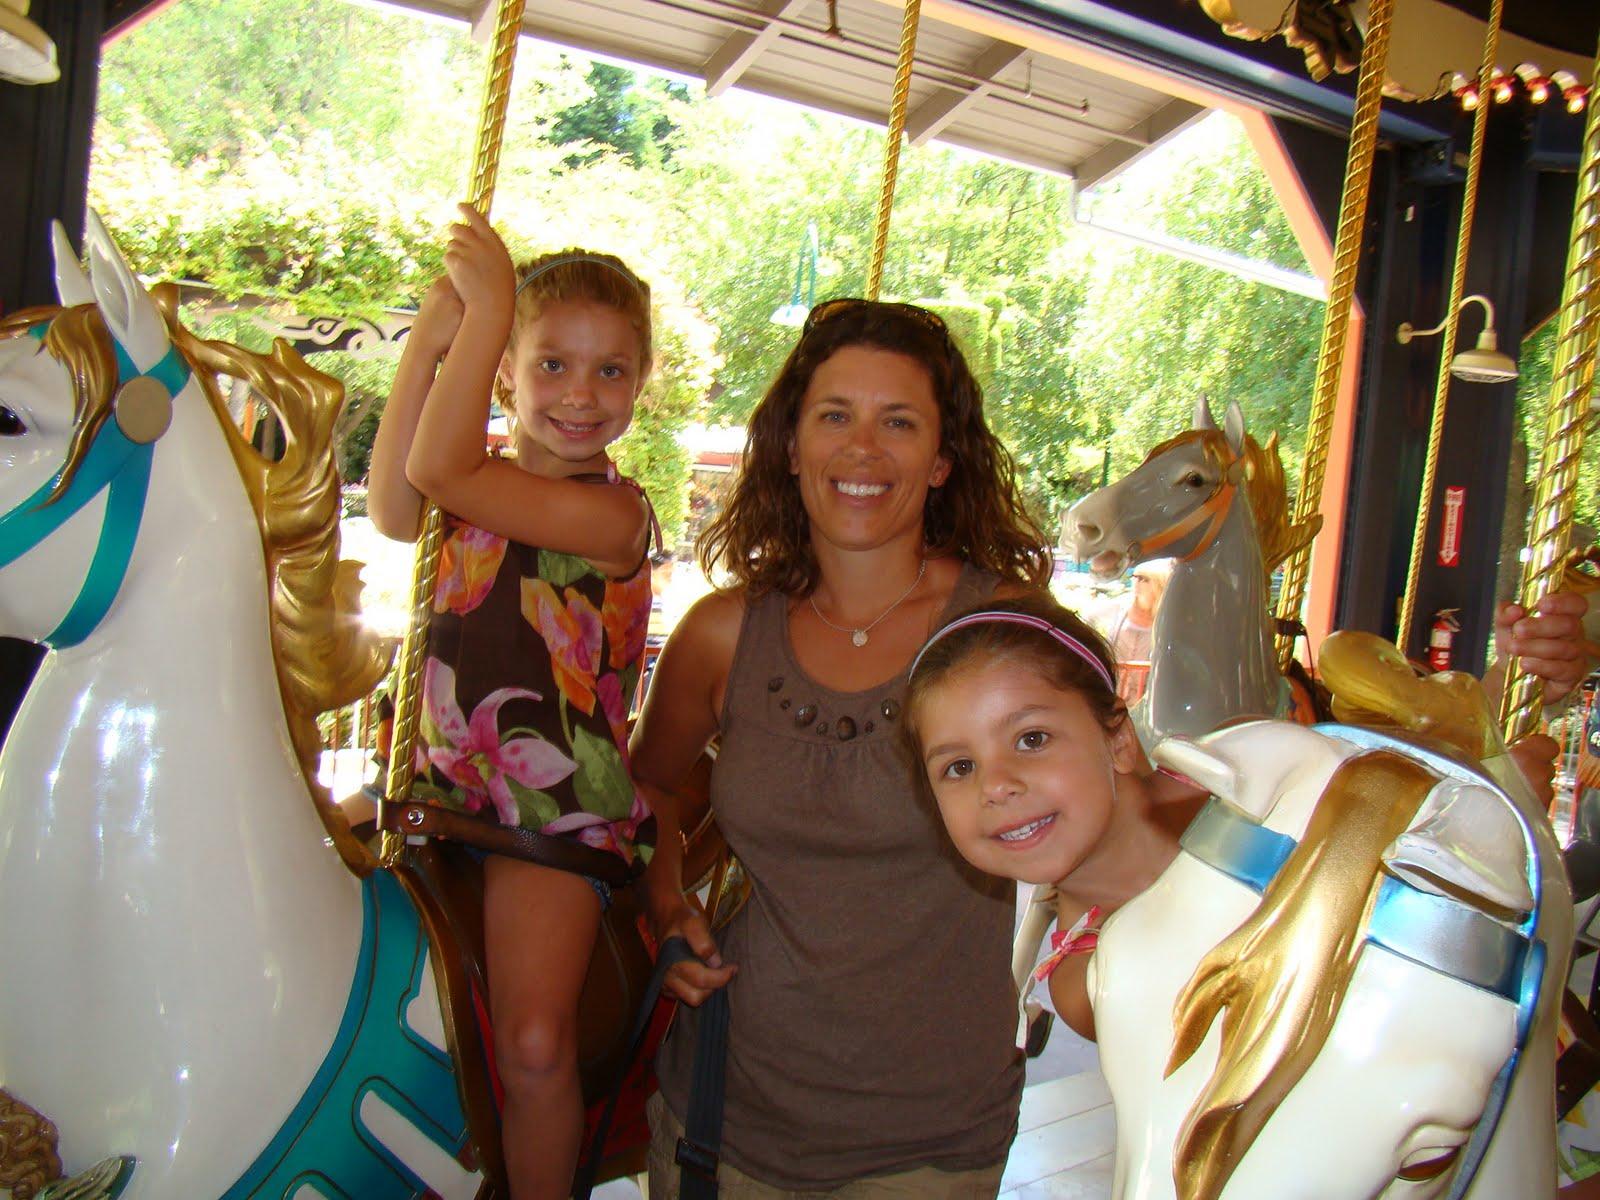 The Brown Family: Gilroy Gardens